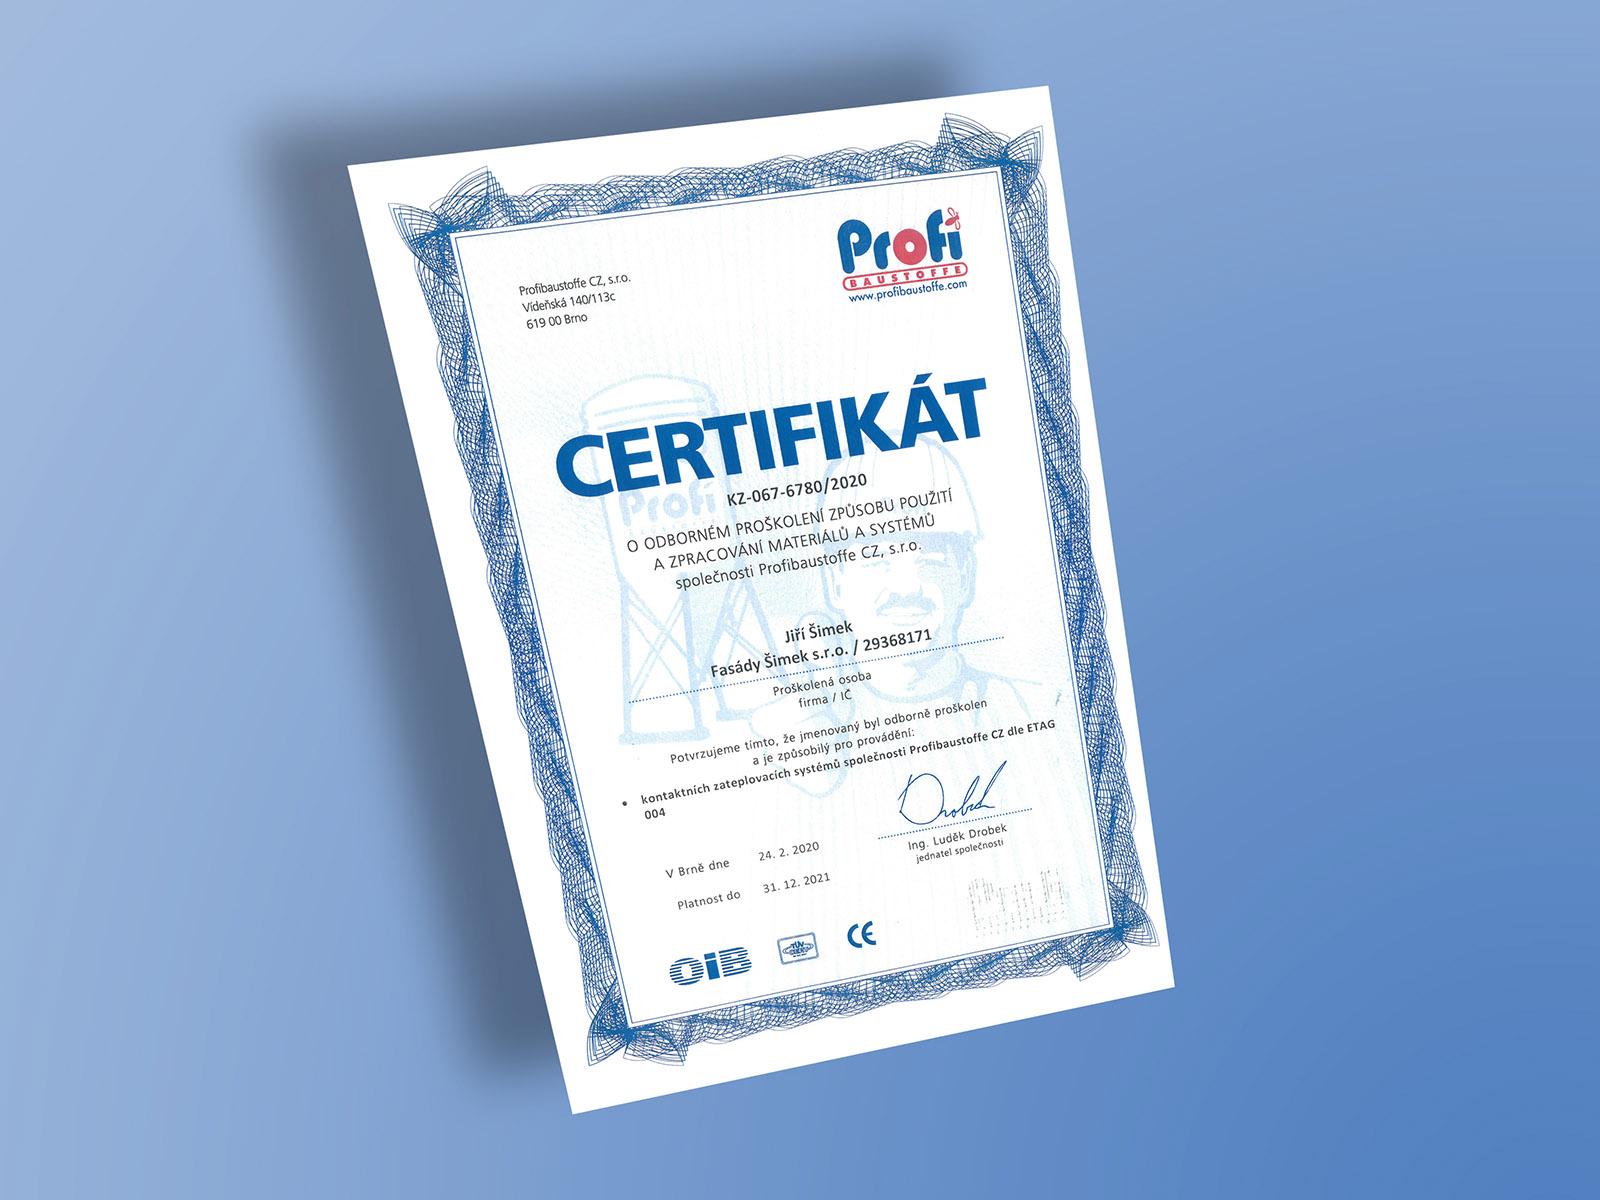 Certifikát Profibaustoffe